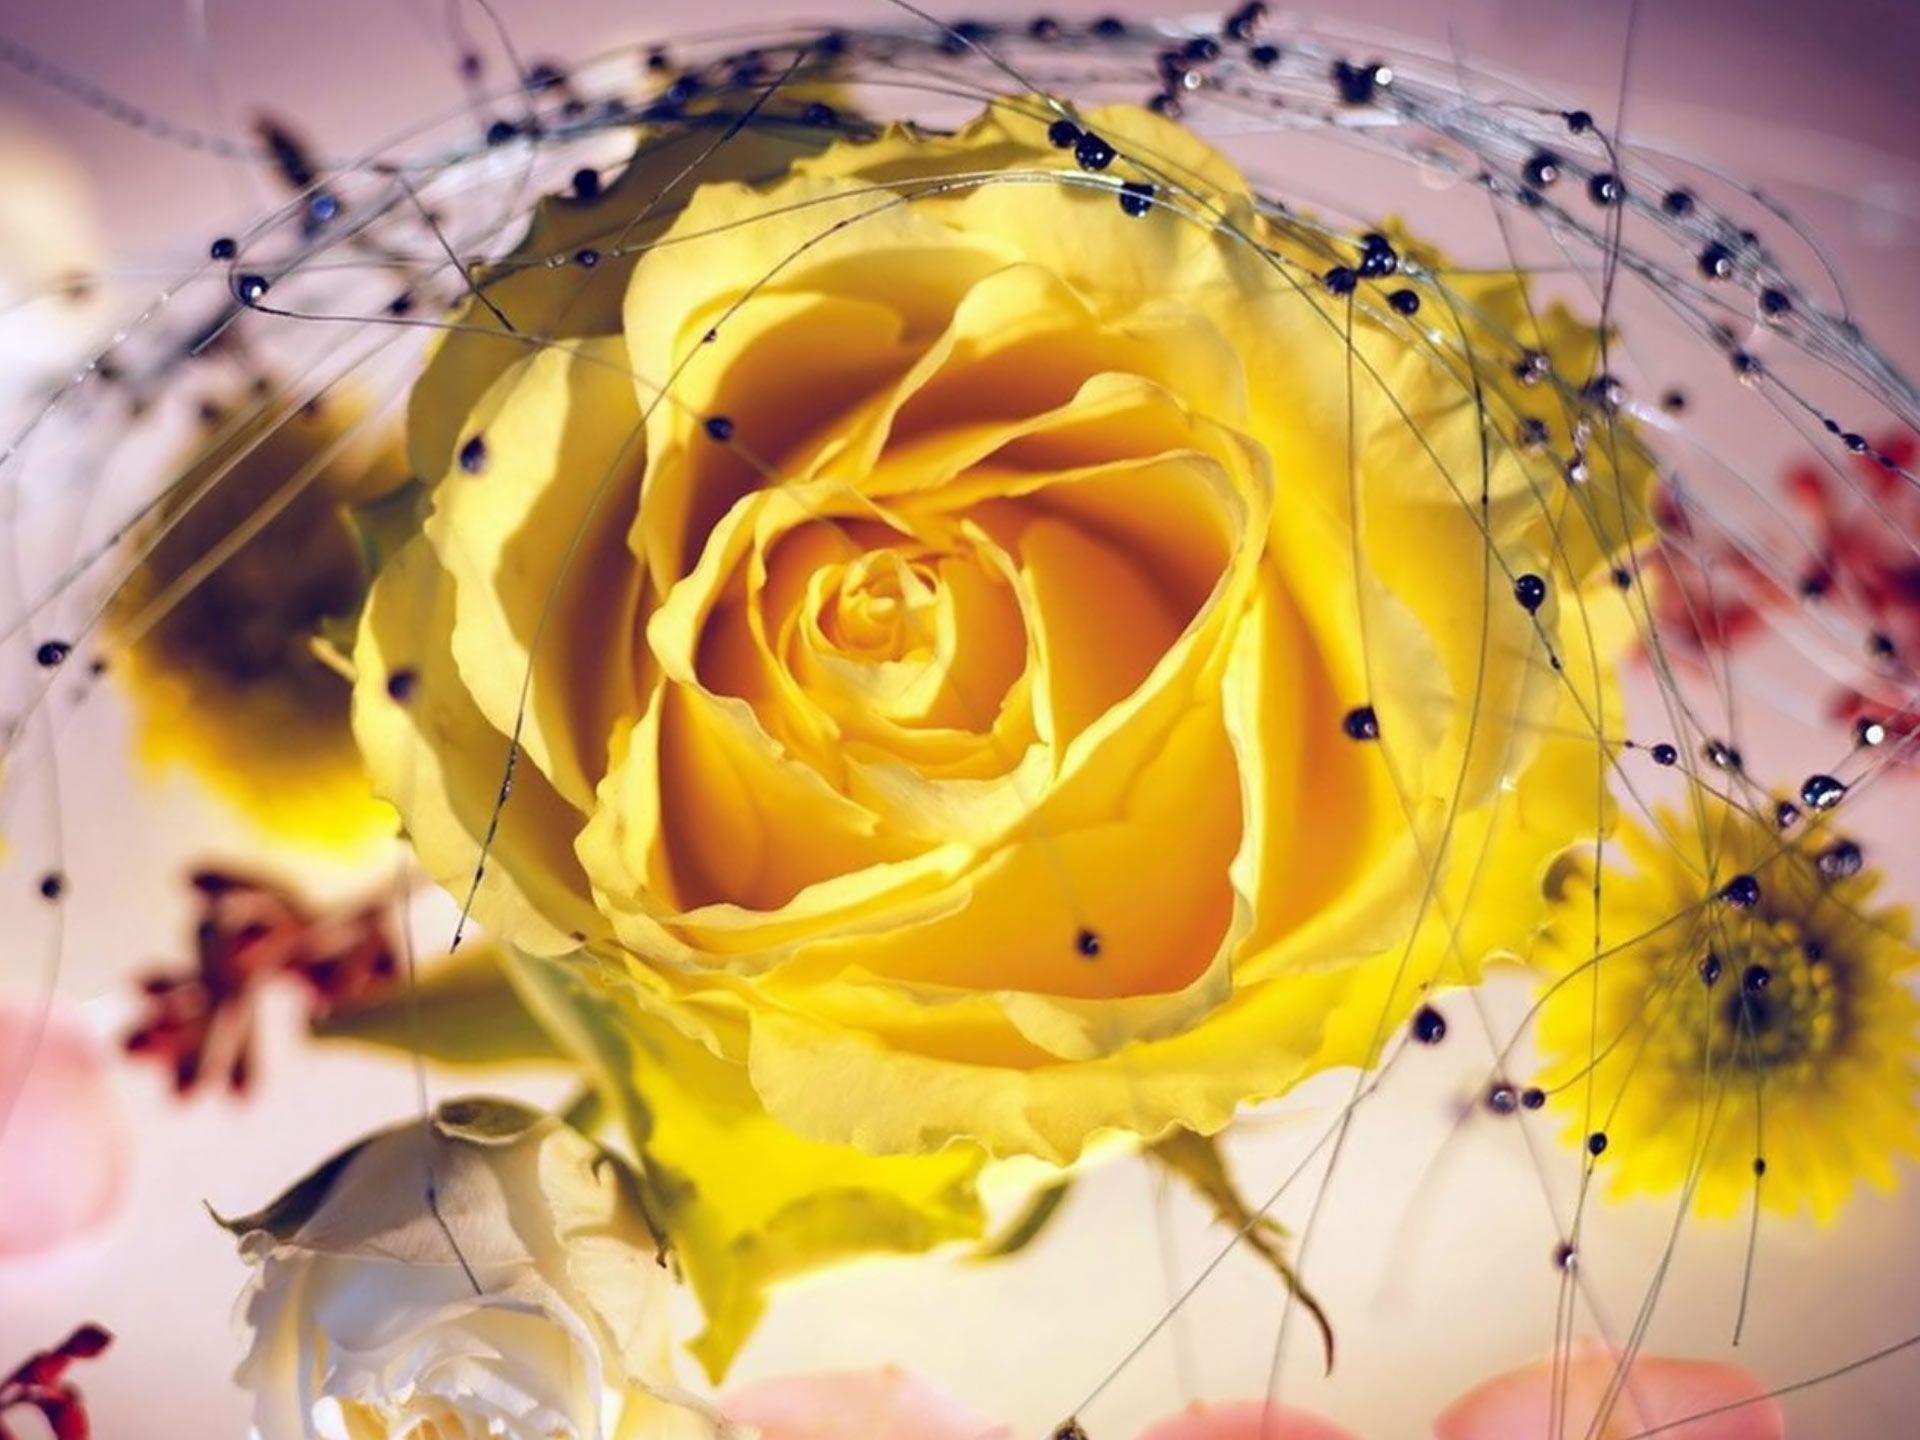 Desktop Backgrounds Animal Life Flowers Yellow Roses